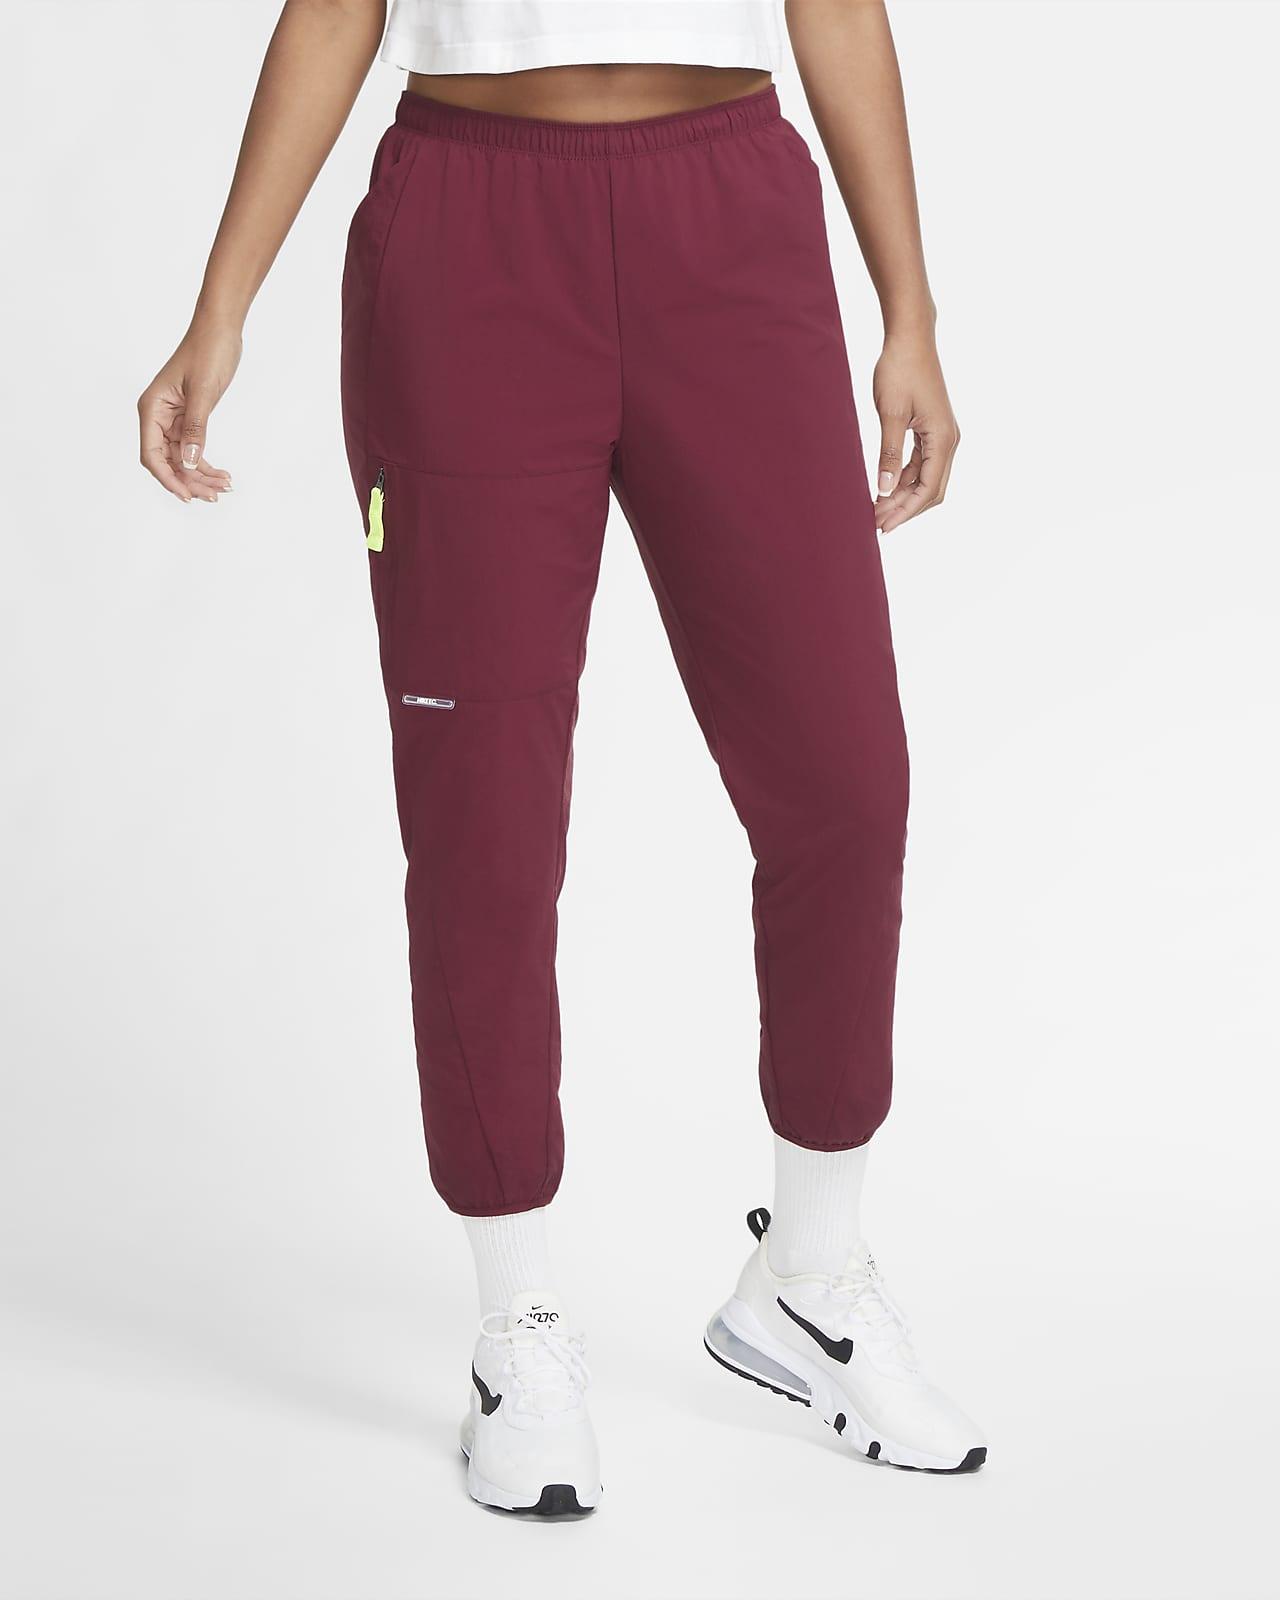 Nike F.C. női futballnadrág